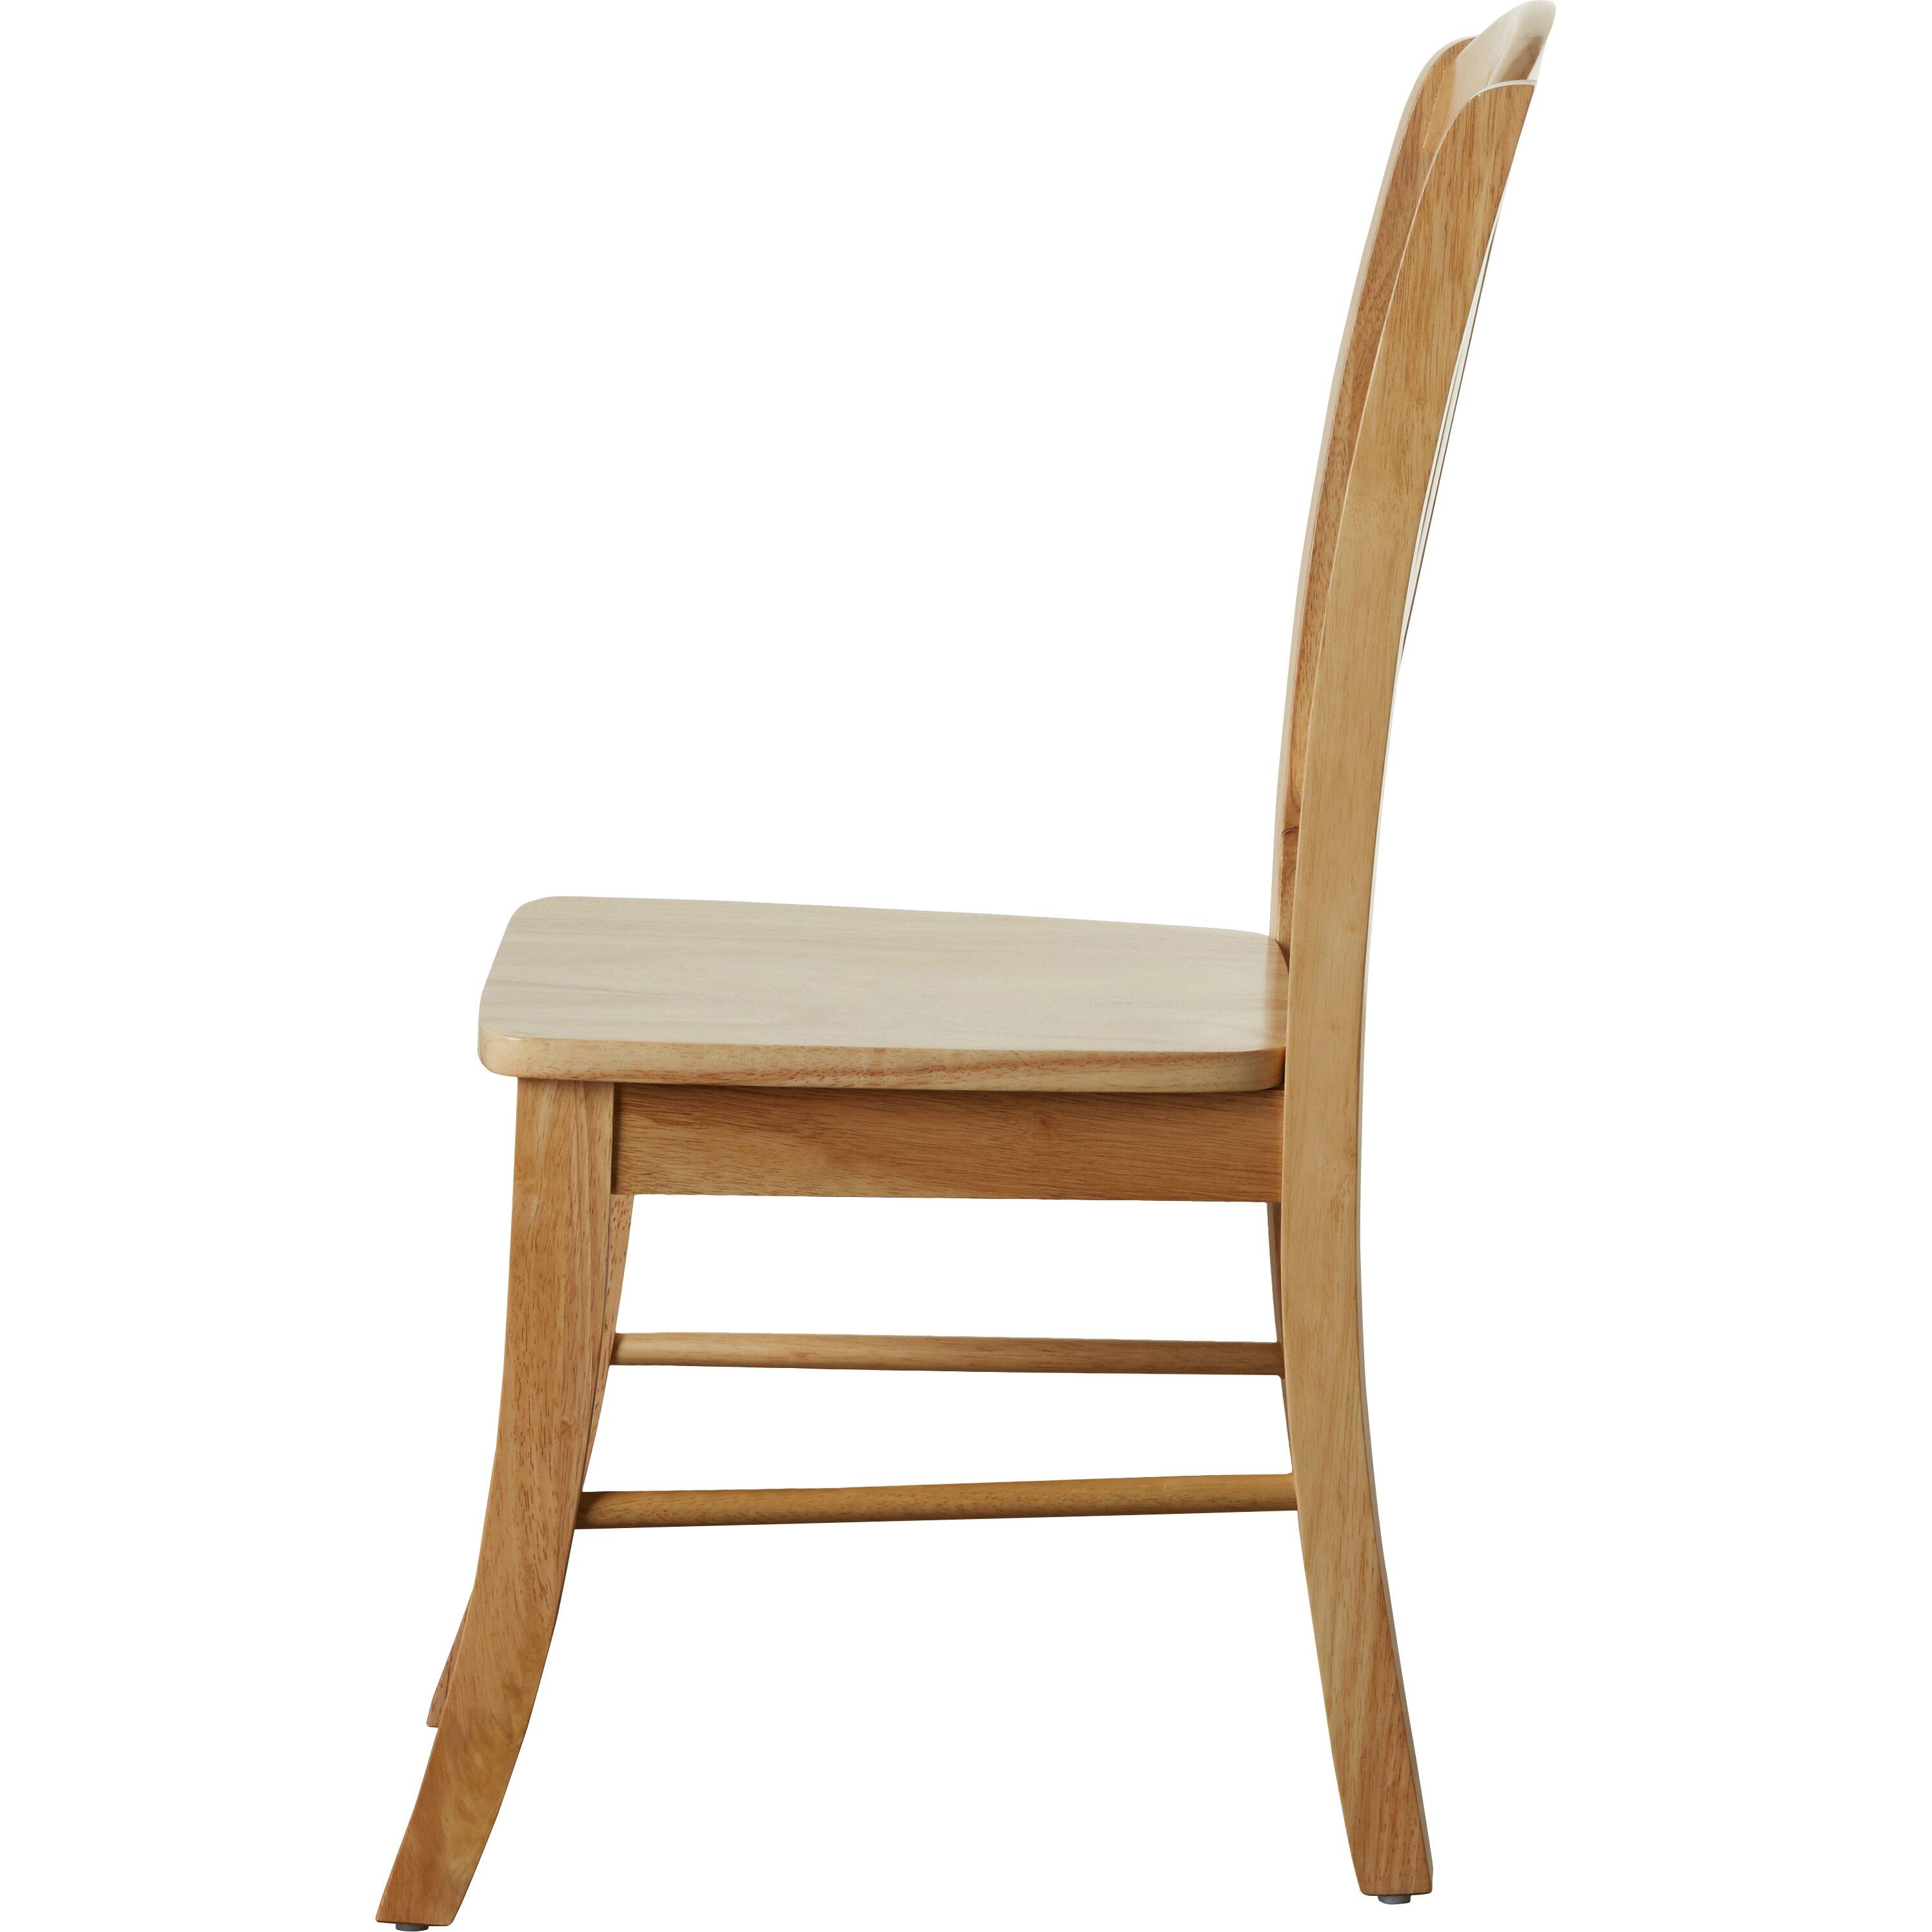 Three posts manheim extendable dining table and 4 chairs for Extendable dining table and chairs